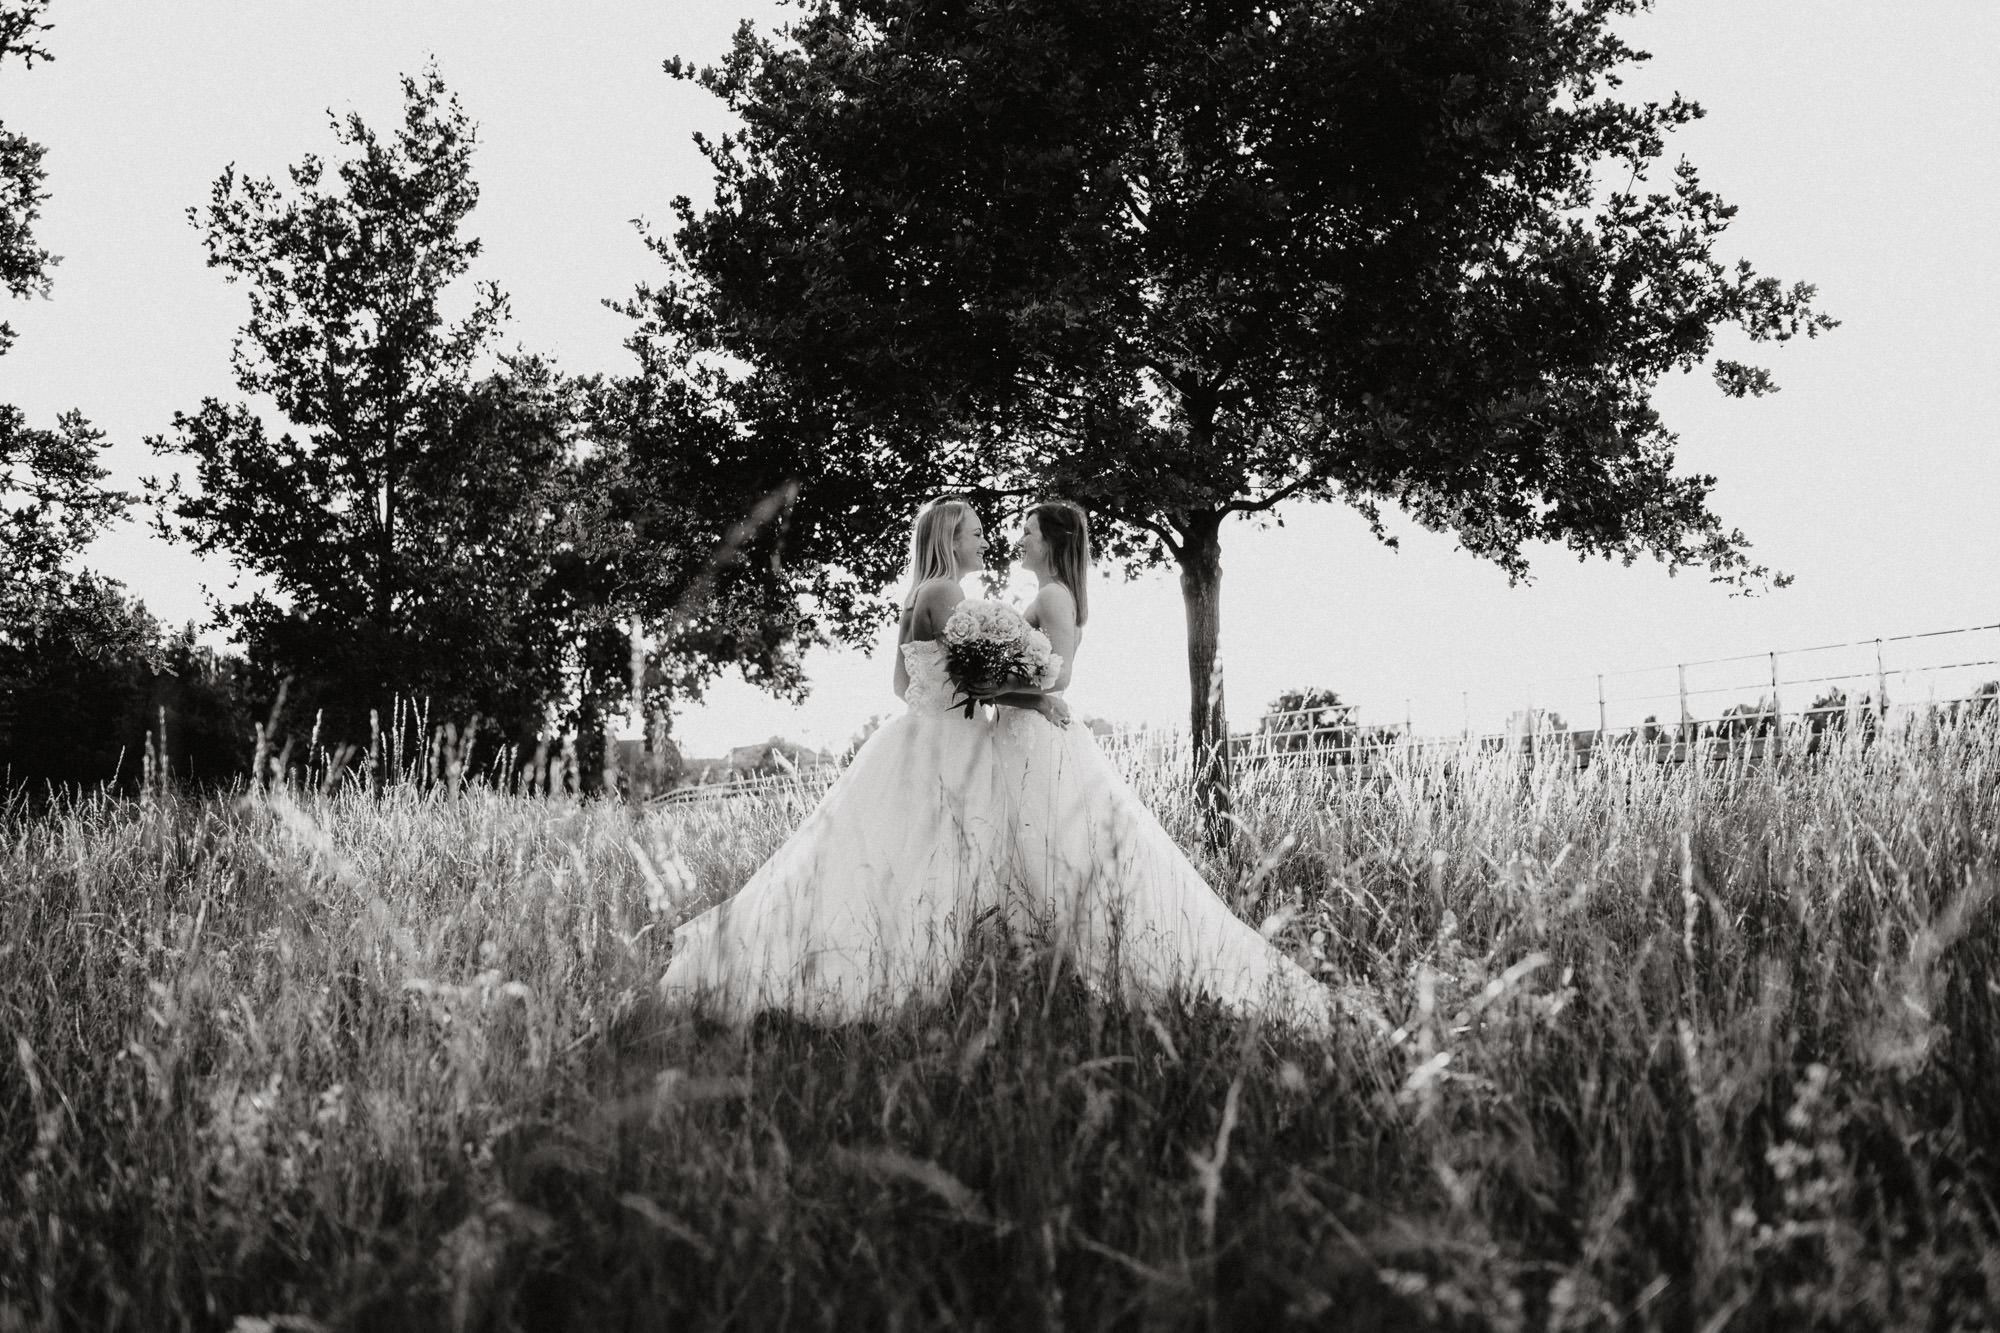 waltsmedia-hochzeitsreportage-after-wedding-shooting-berlin-9